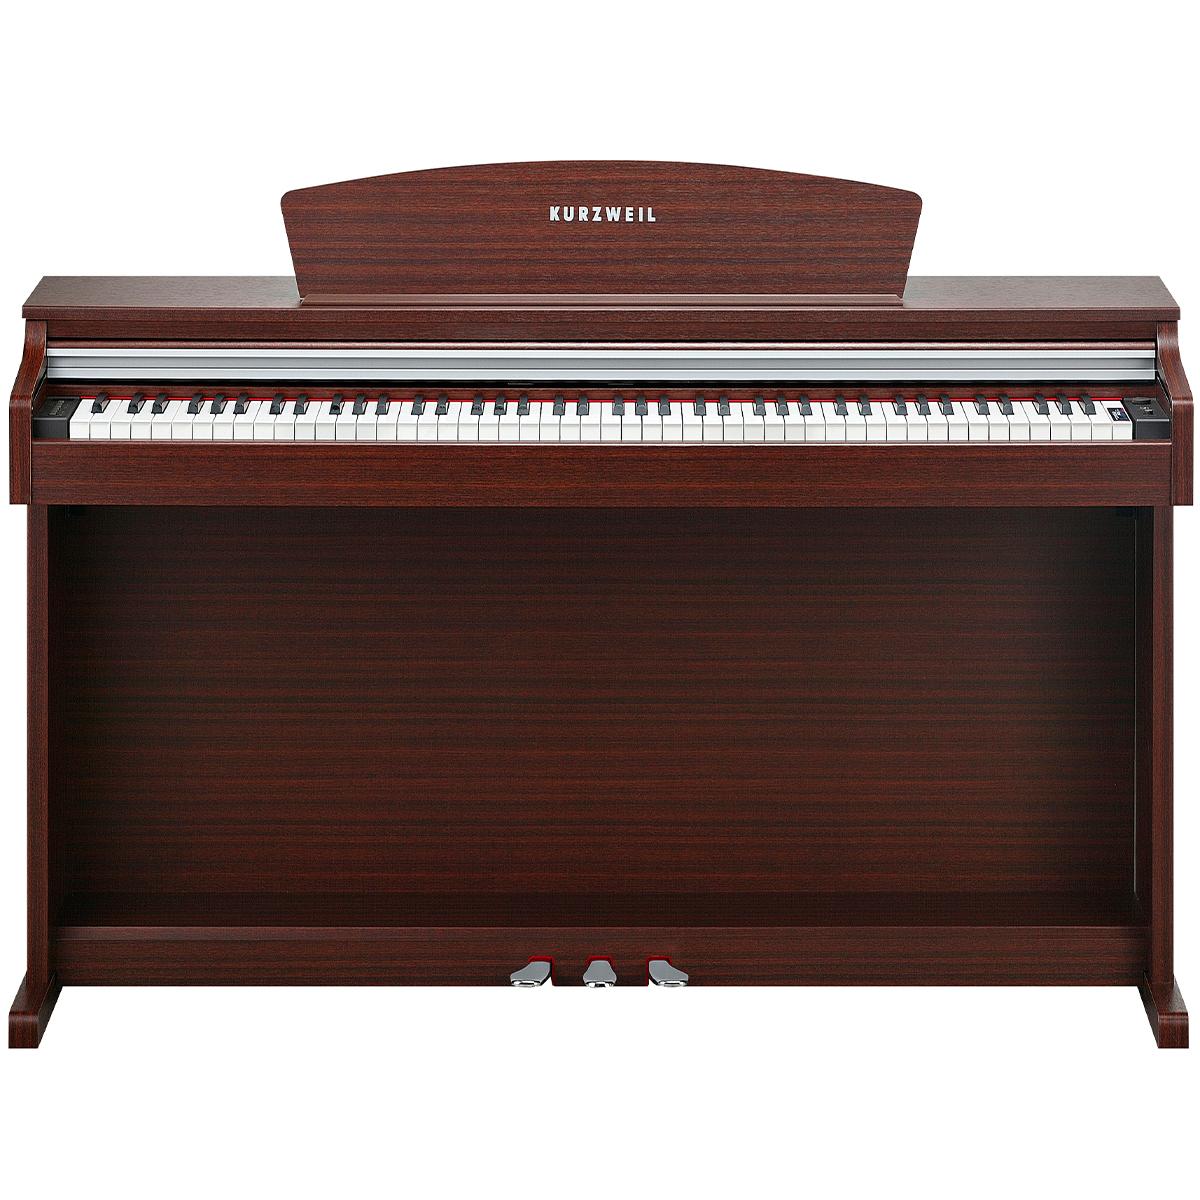 KURZWEIL M110SM: Fully-Weighted, 88 Note, Hammer-Action Digital Piano (Mahogany)